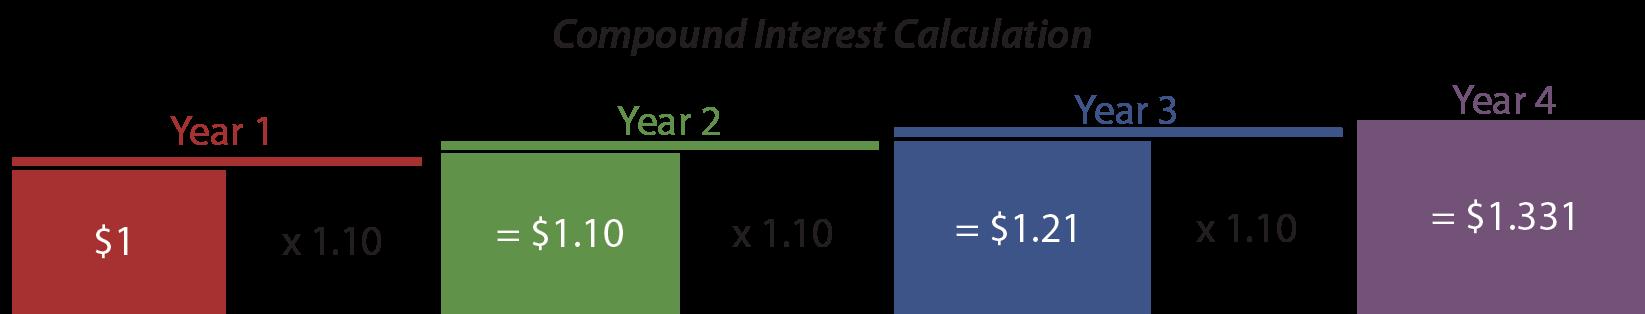 Compound Interest Calculation Illustration